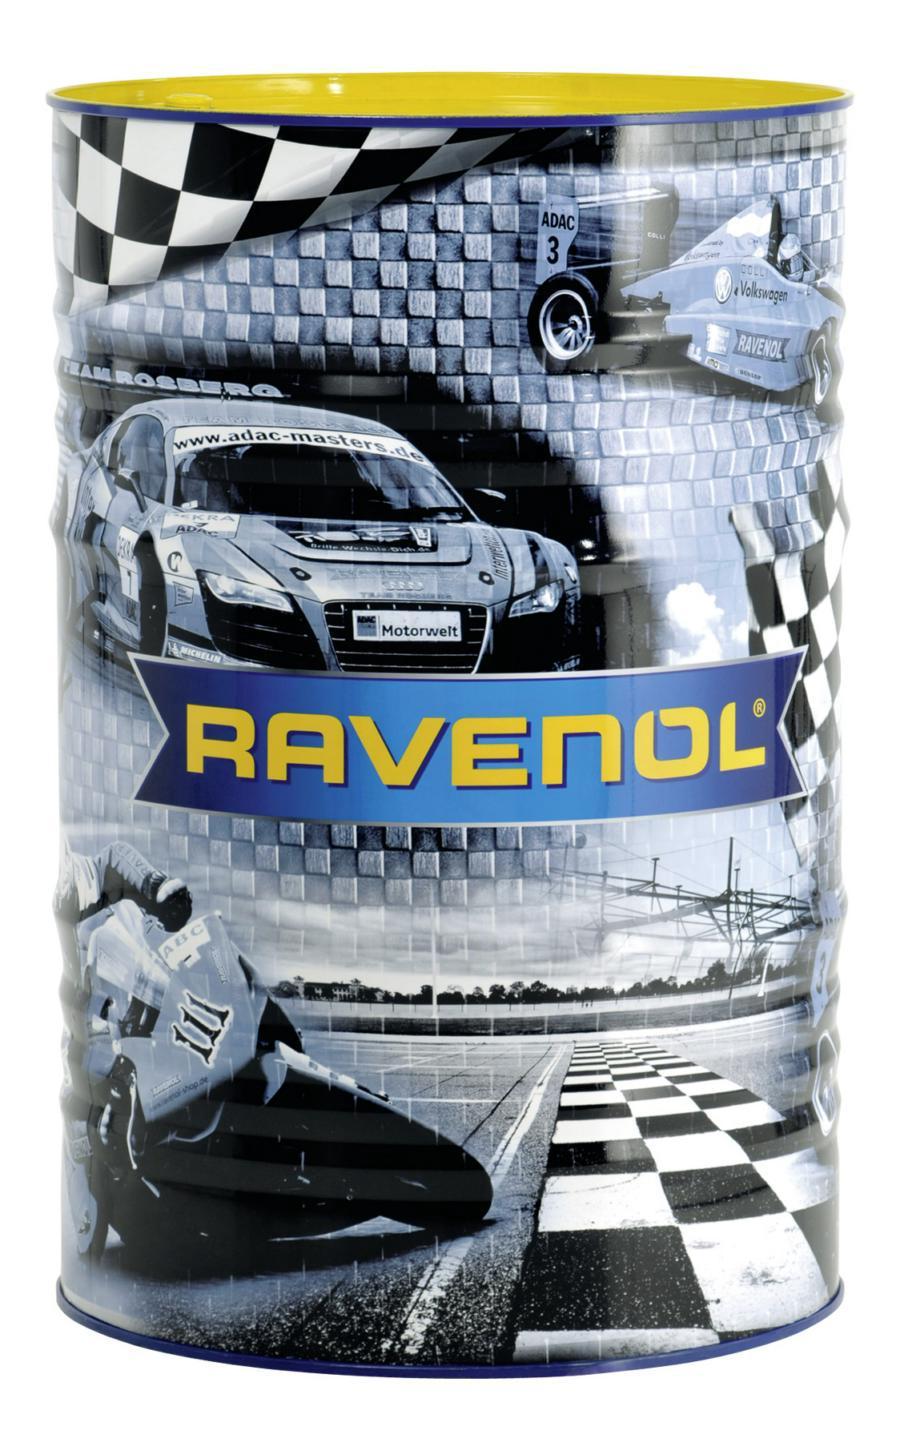 Ravenol ATF SP-IV Fluid